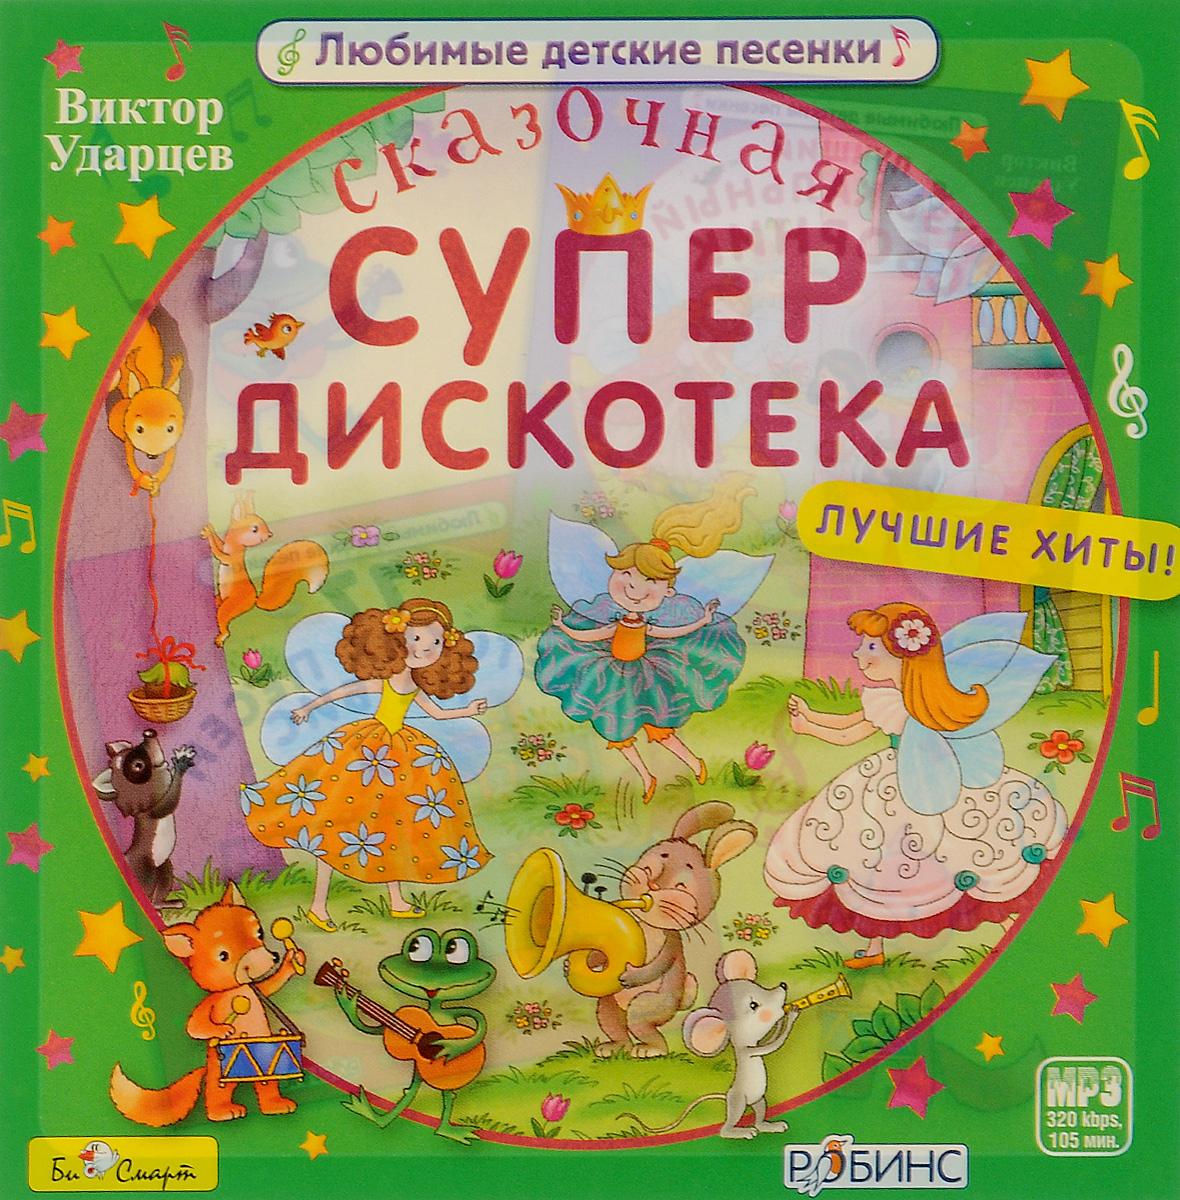 Виктор Ударцев. Сказочная супердискотека (mp3)